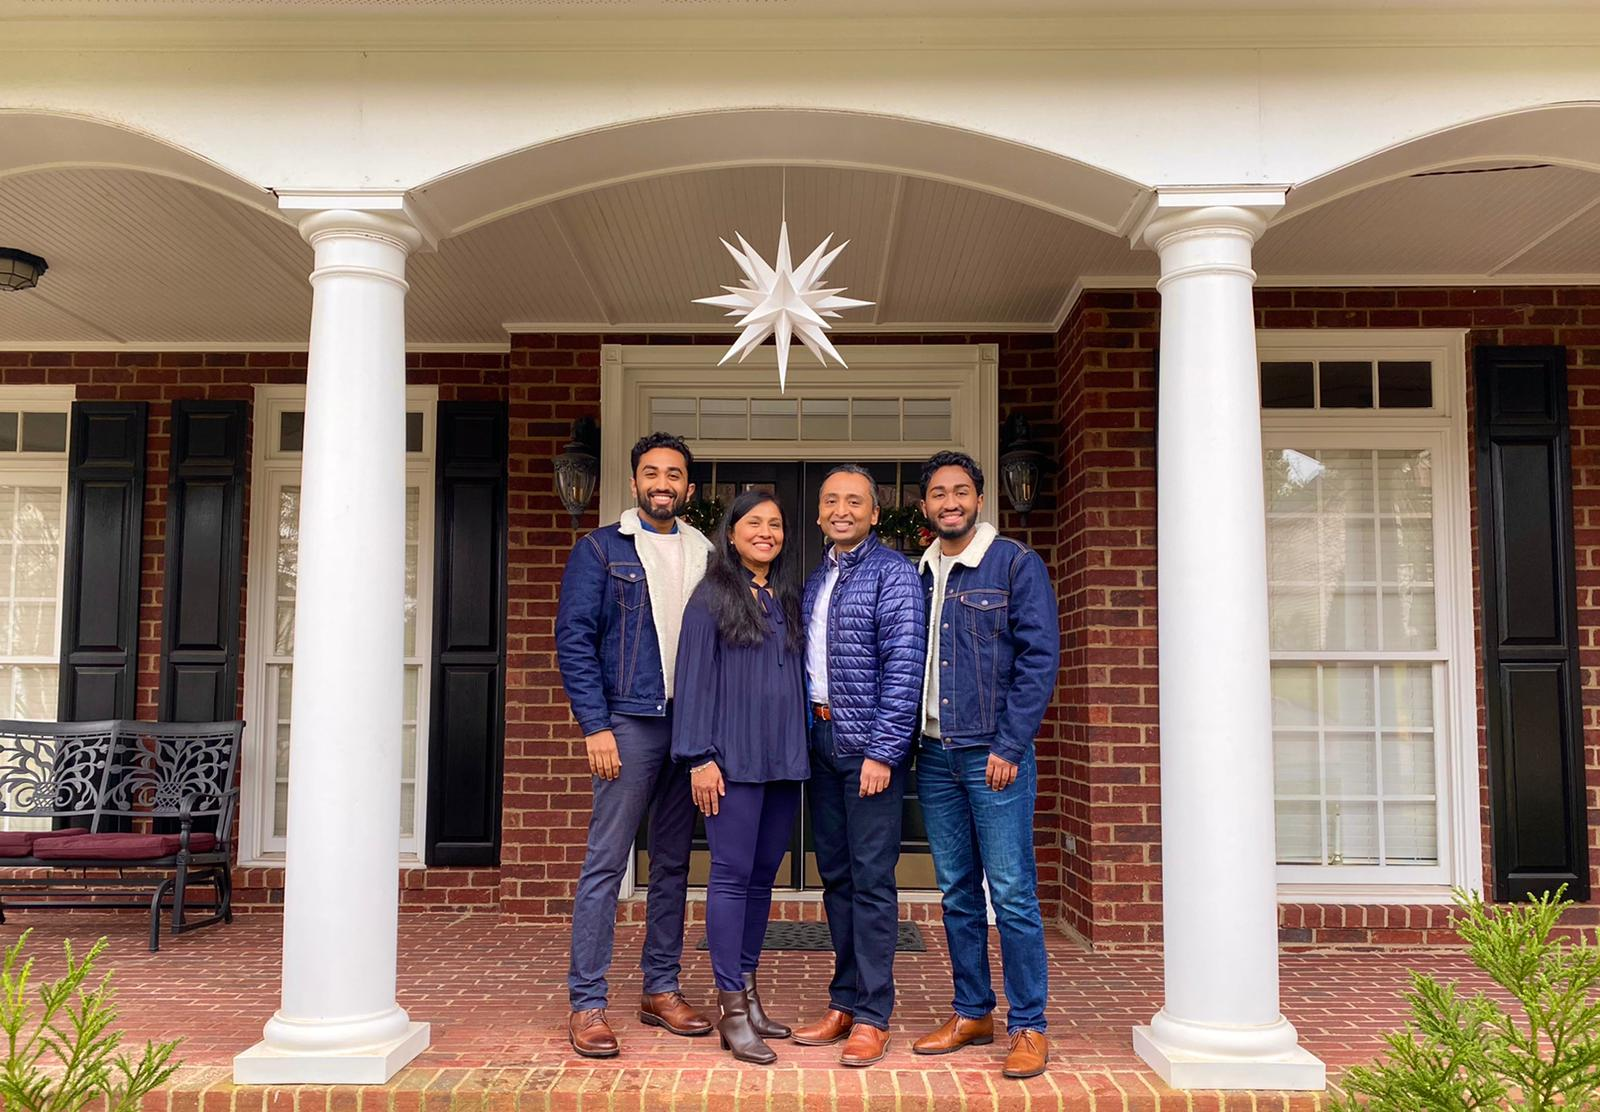 Thomas Family - December 2020